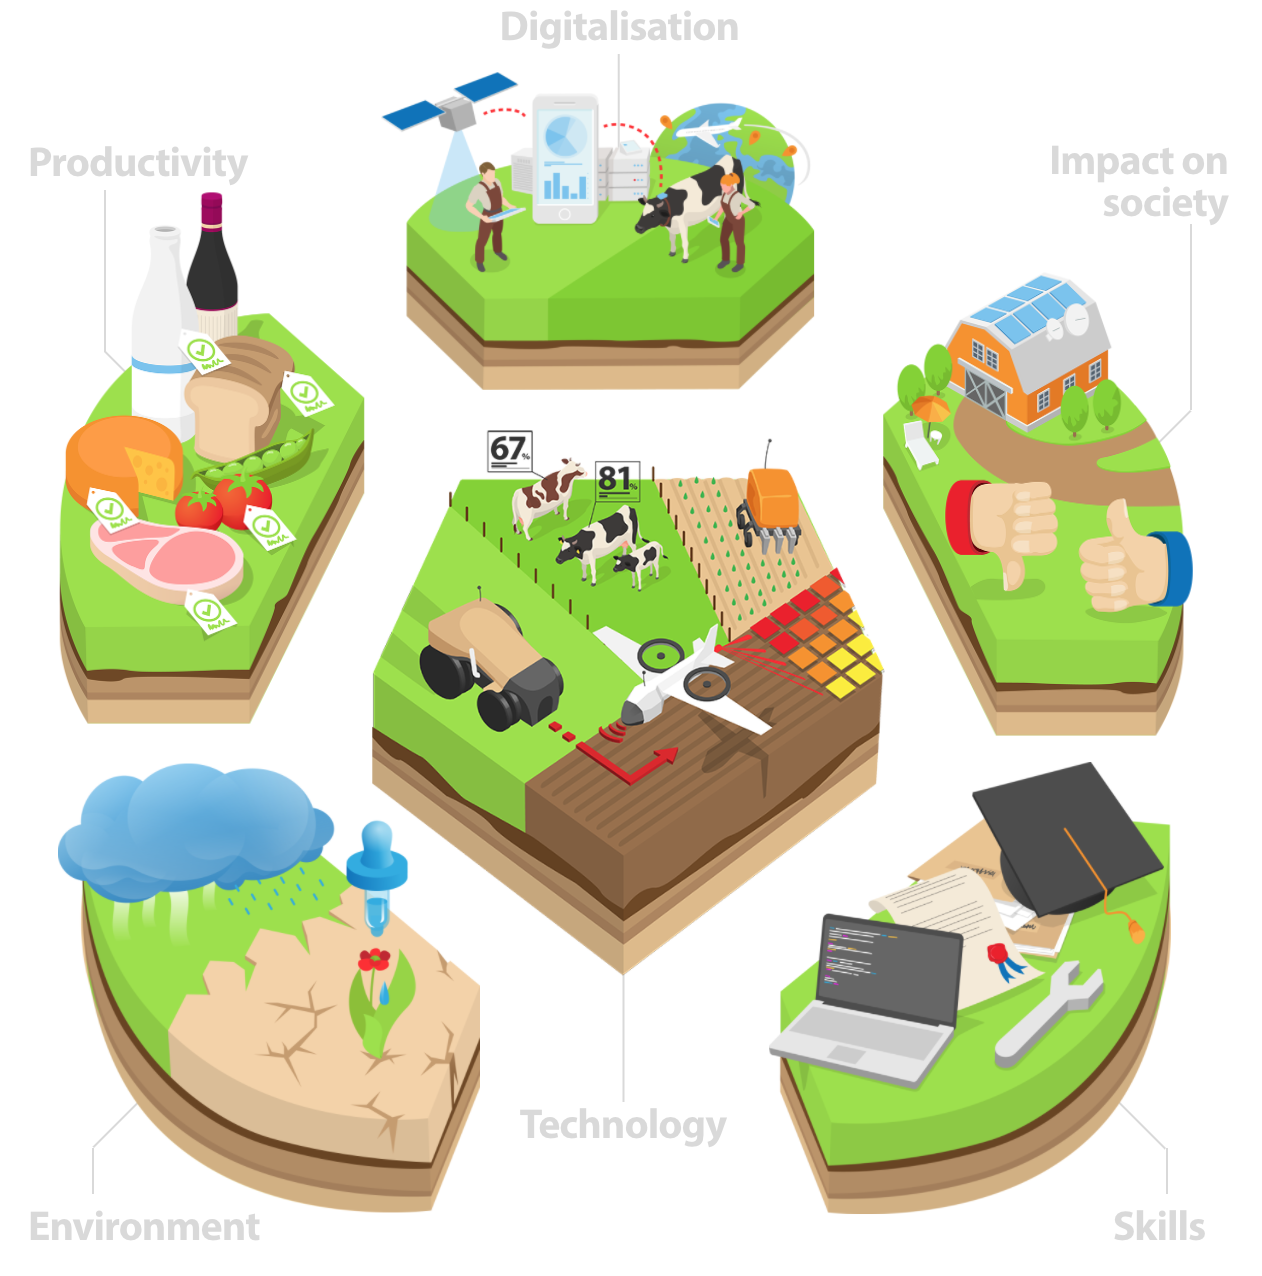 Source: EU STOA website - precision agriculture - fields